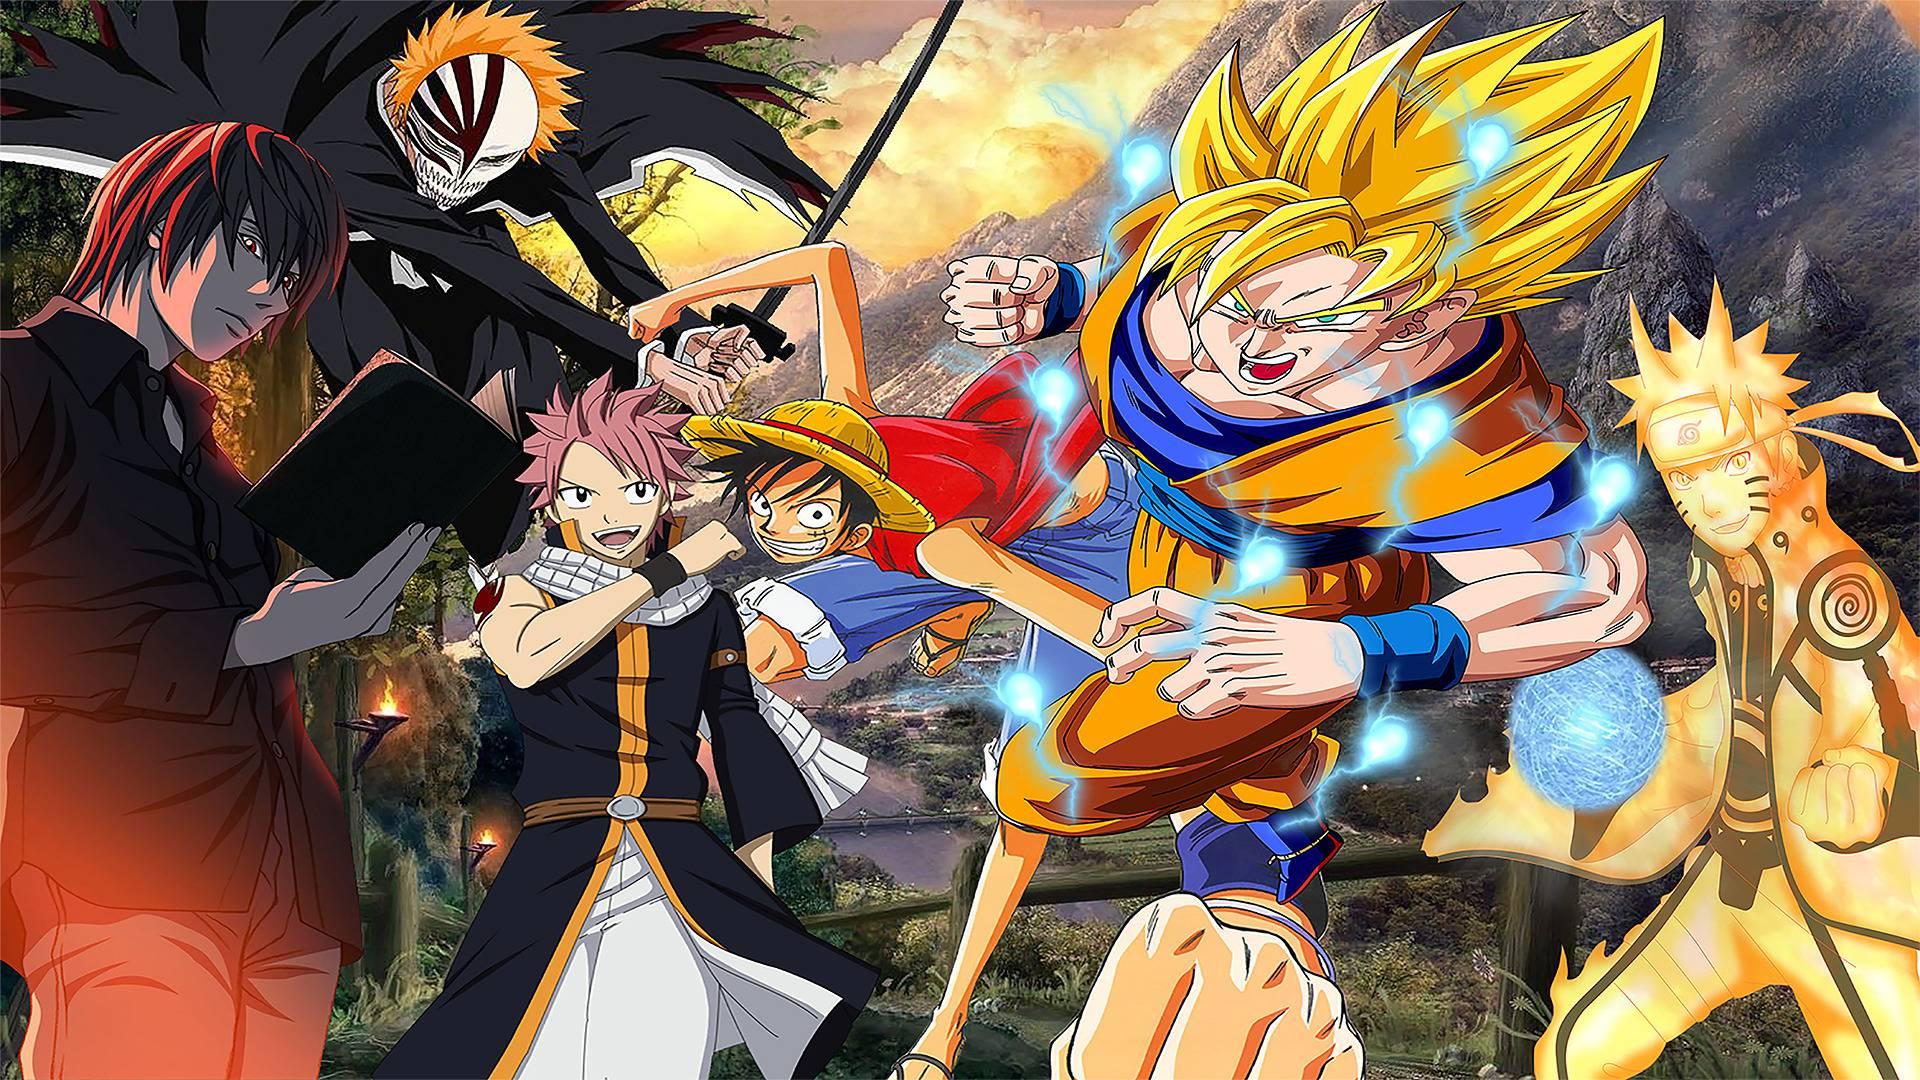 anime characters anime hd wallpaper 1920x1080 11058 Fairy Tail 1920x1080